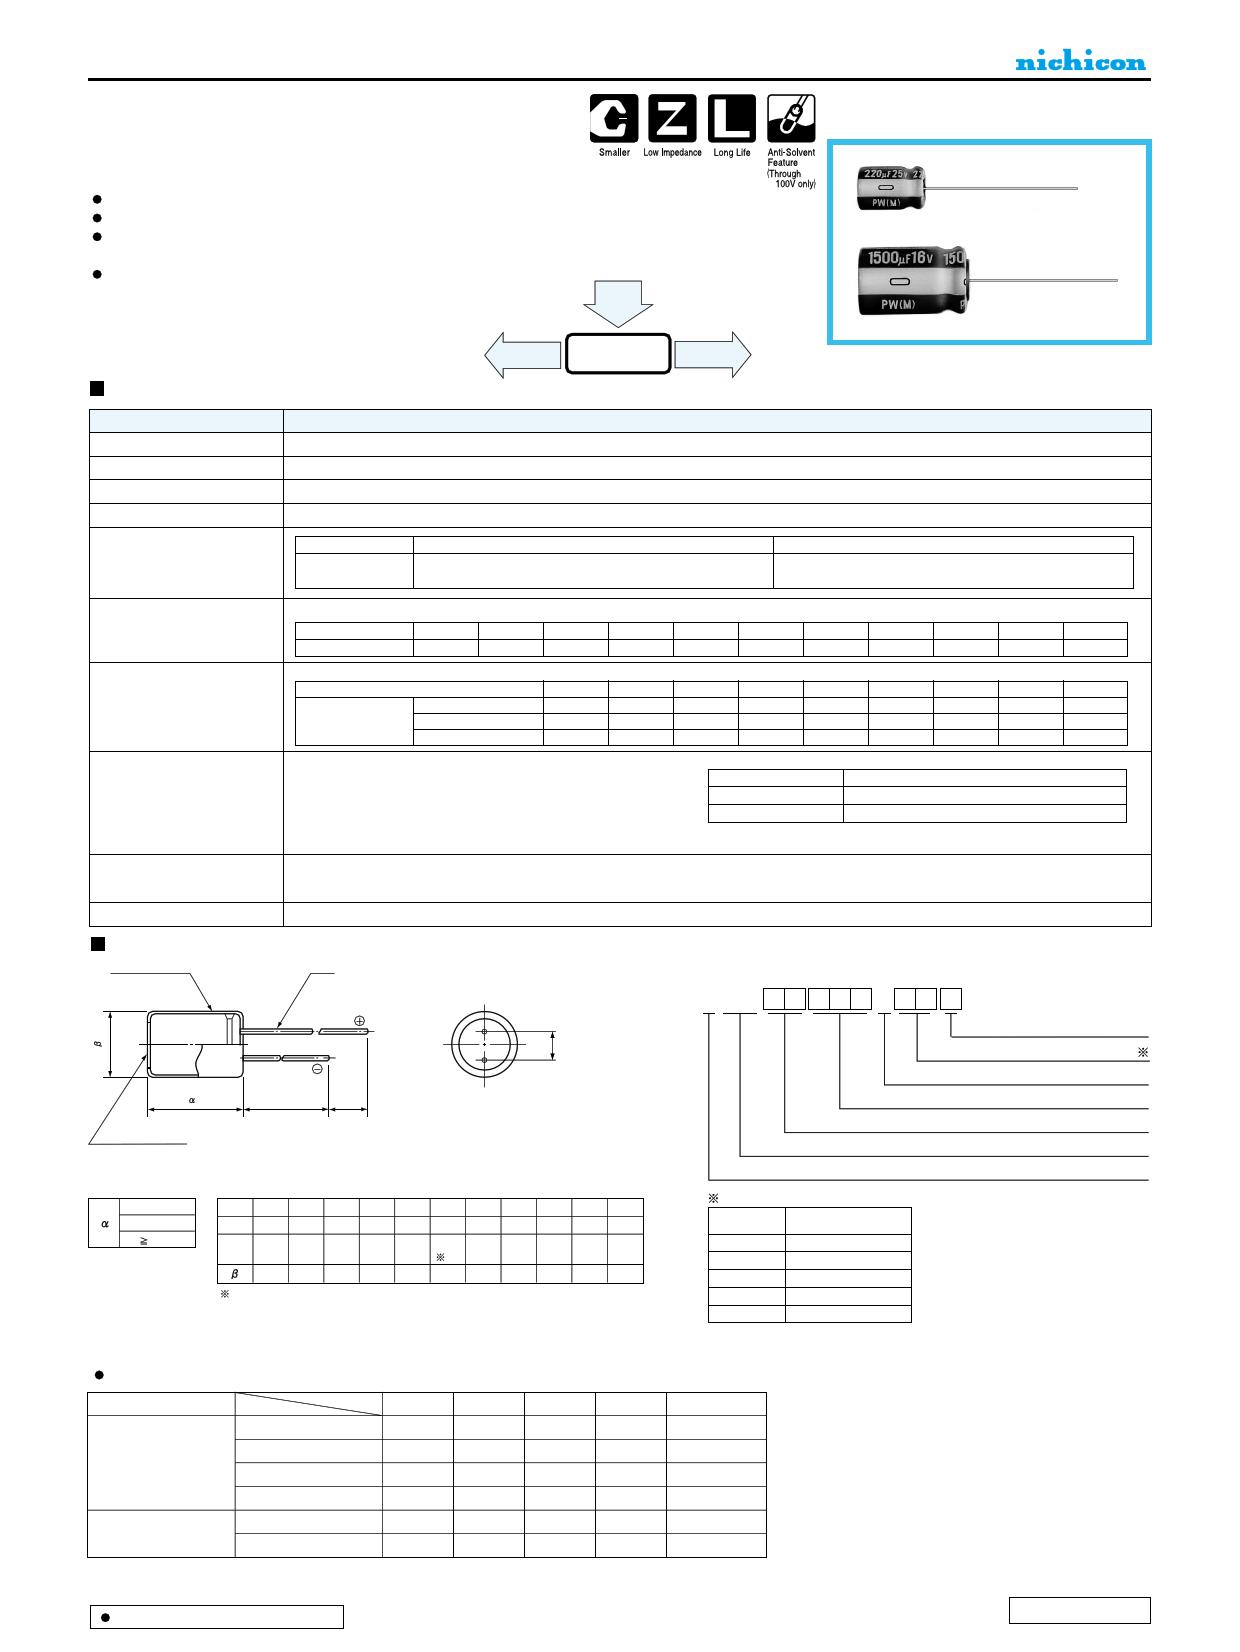 UPW1J471MHD6 데이터시트 및 UPW1J471MHD6 PDF